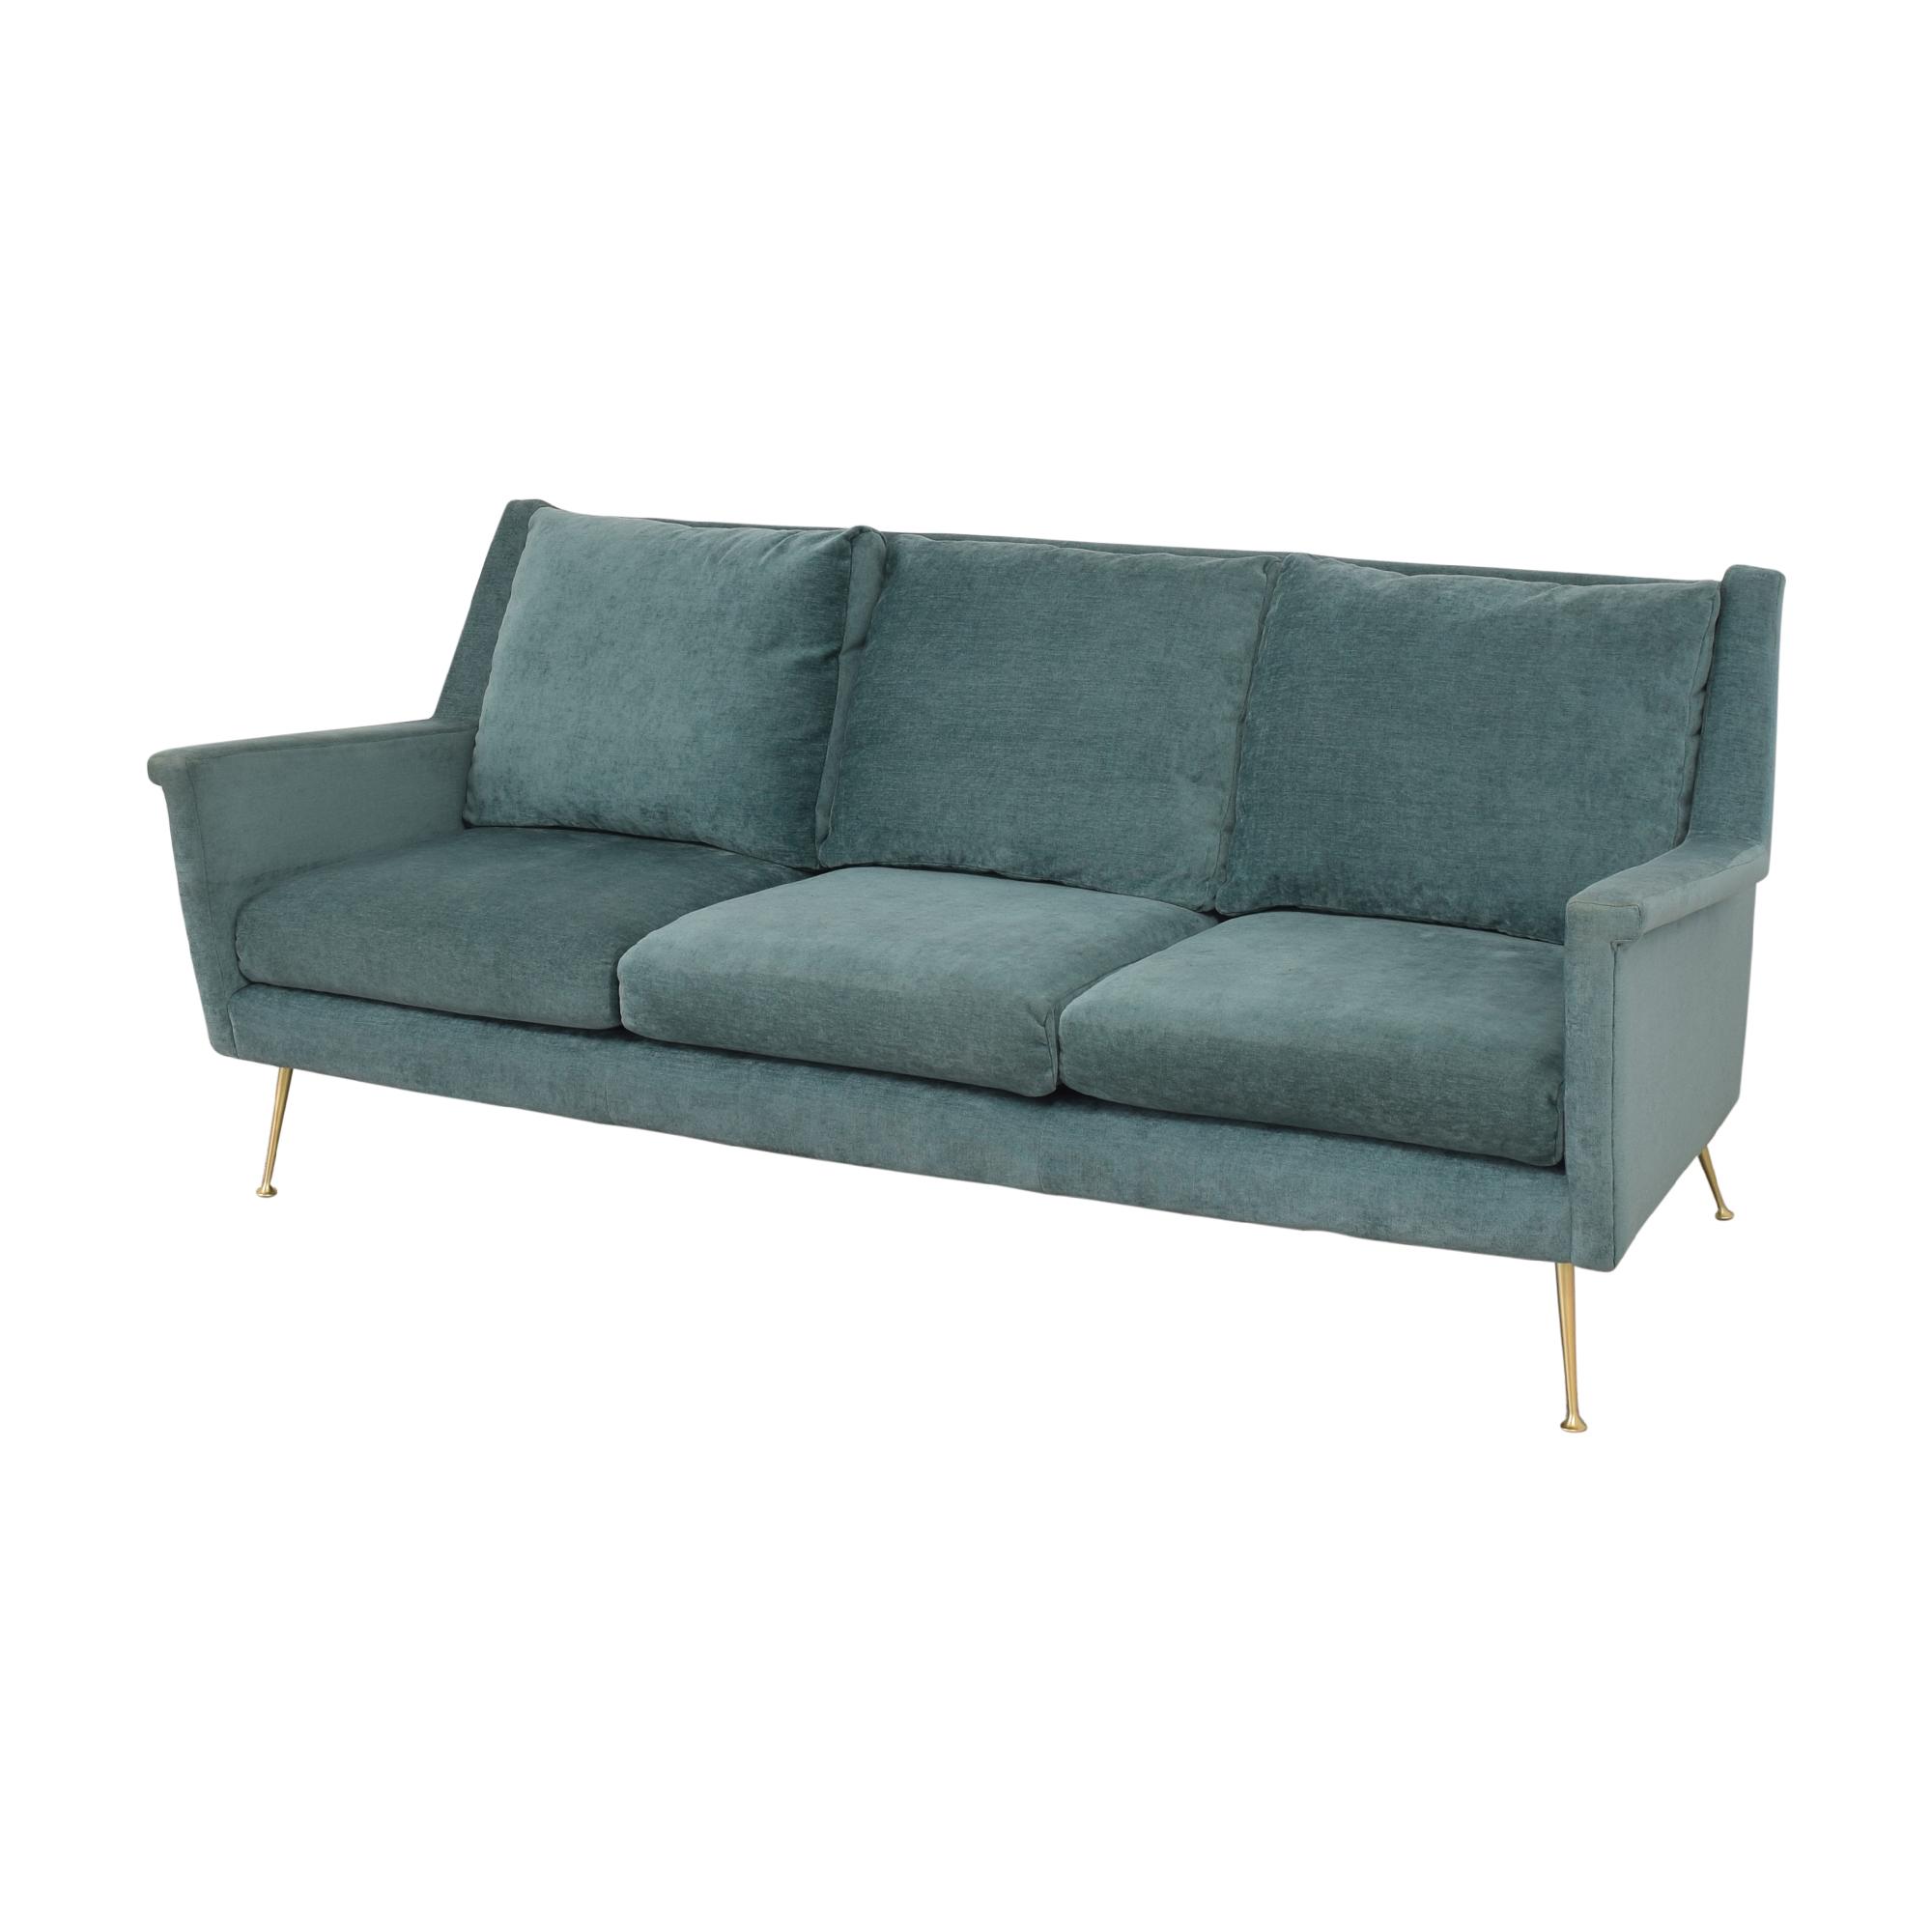 West Elm Carlo Mid Century Sofa sale